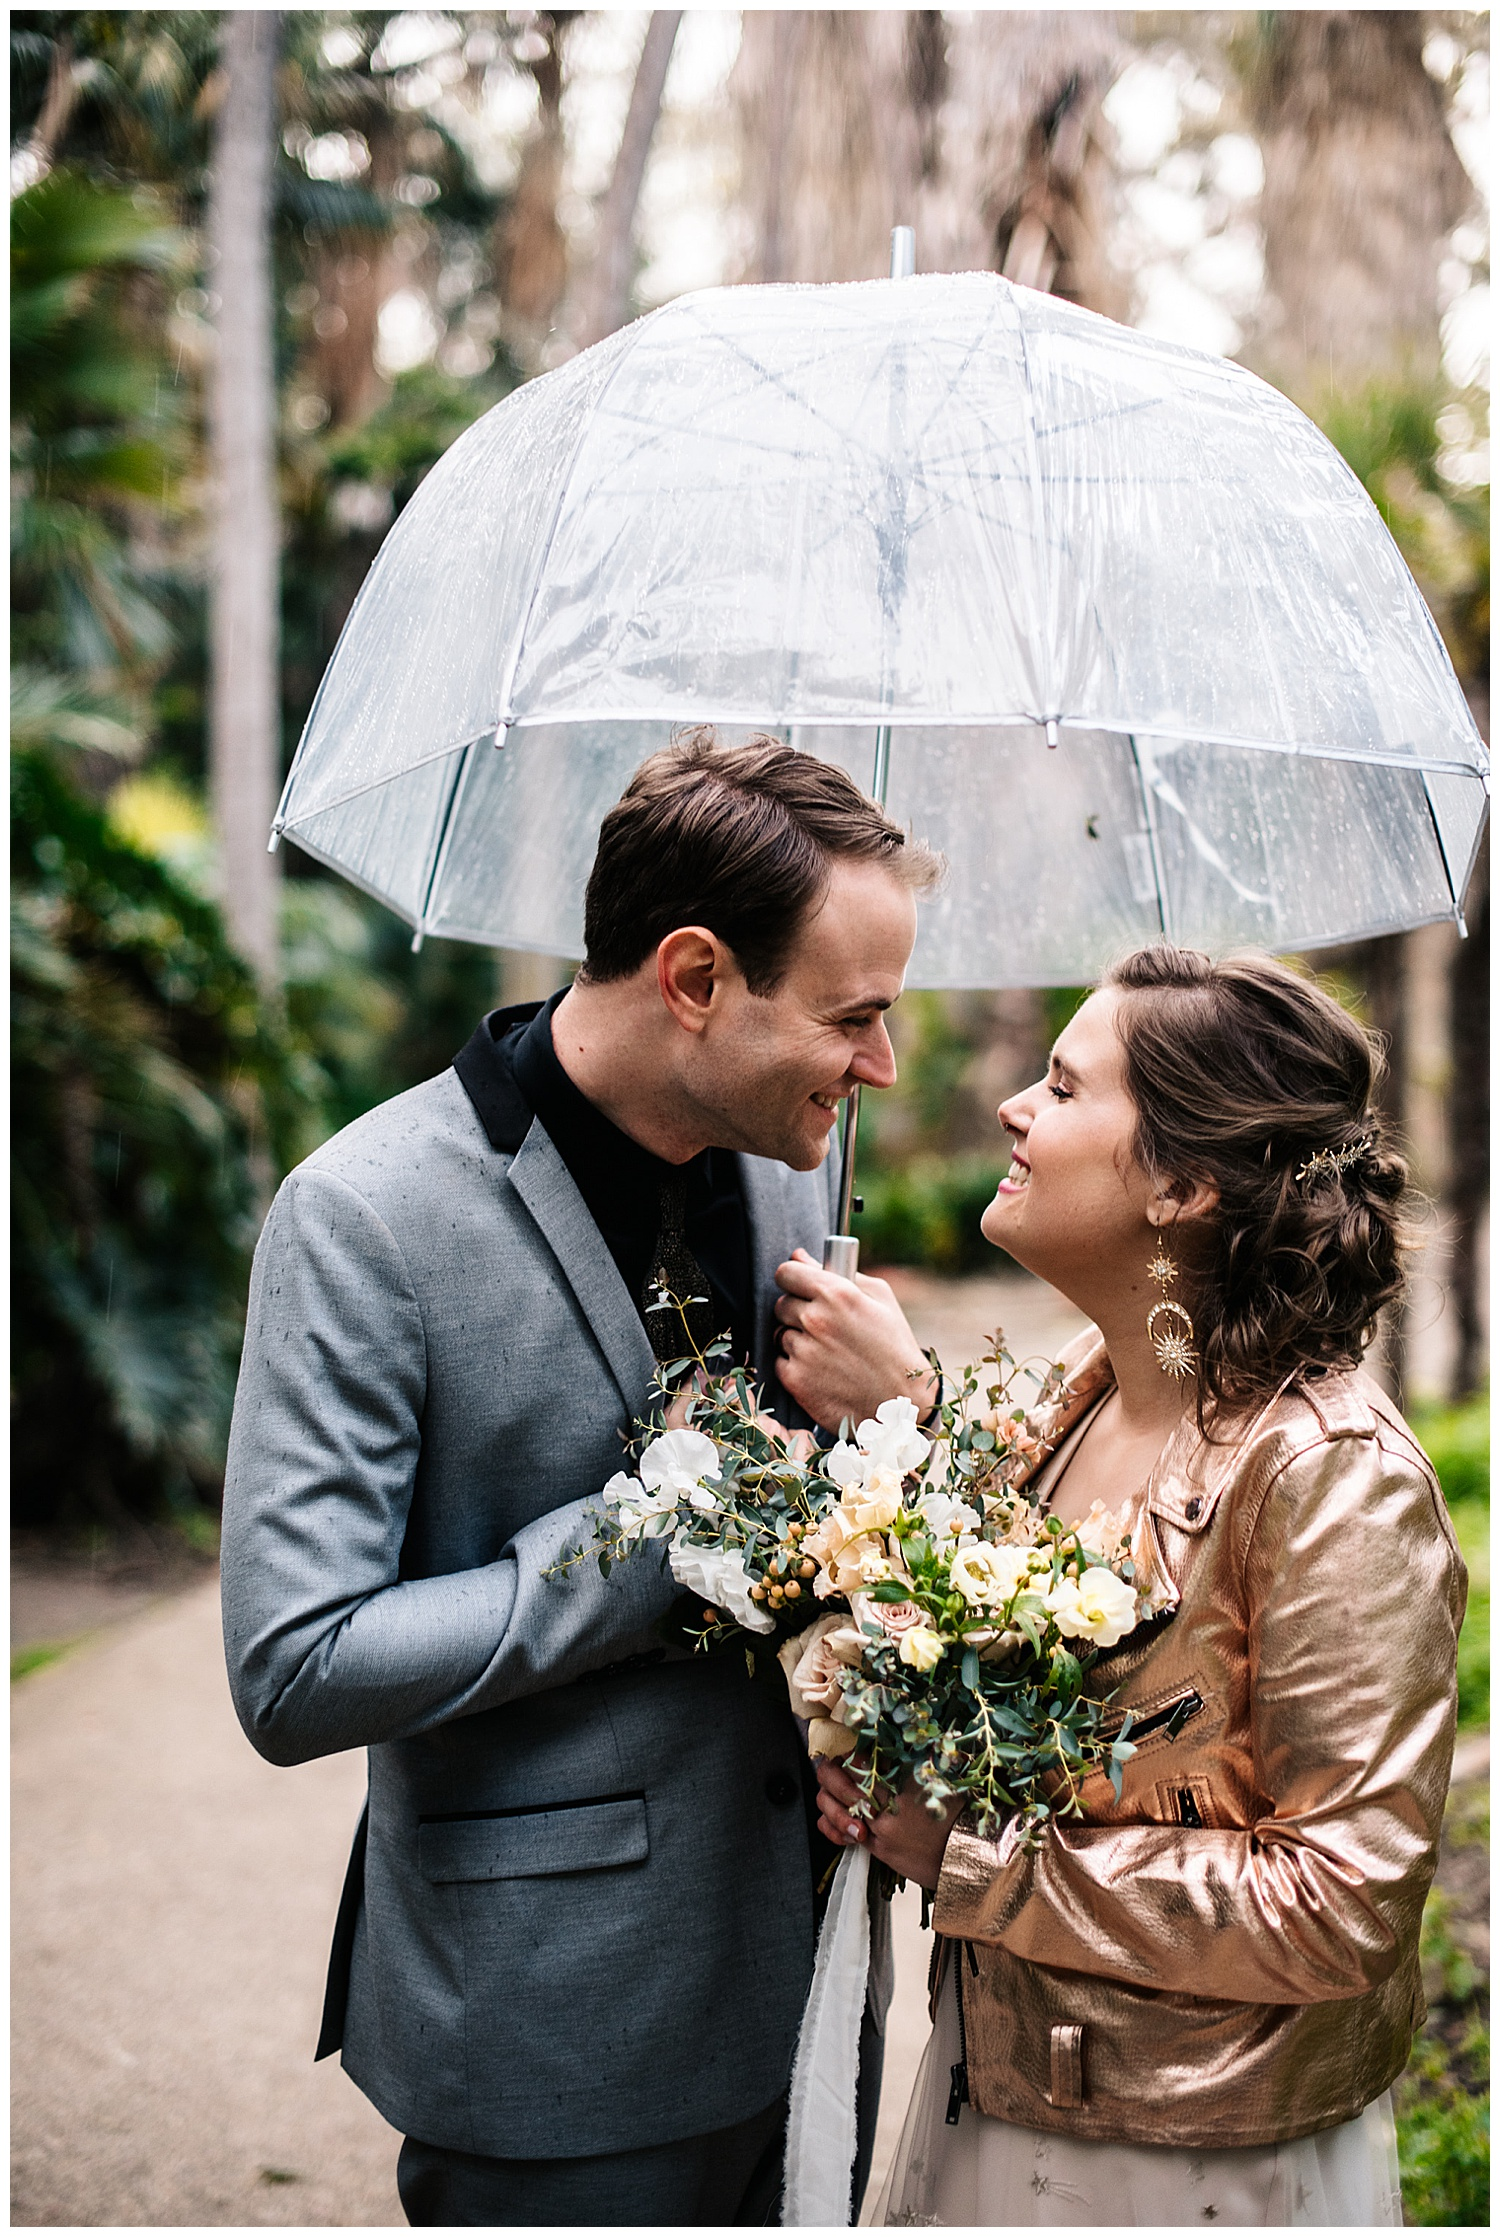 SamEricaStudios - San Diego Wedding Photographer - Galaxy Themed Rainy Day Wedding Parq West San Diego_0034.jpg